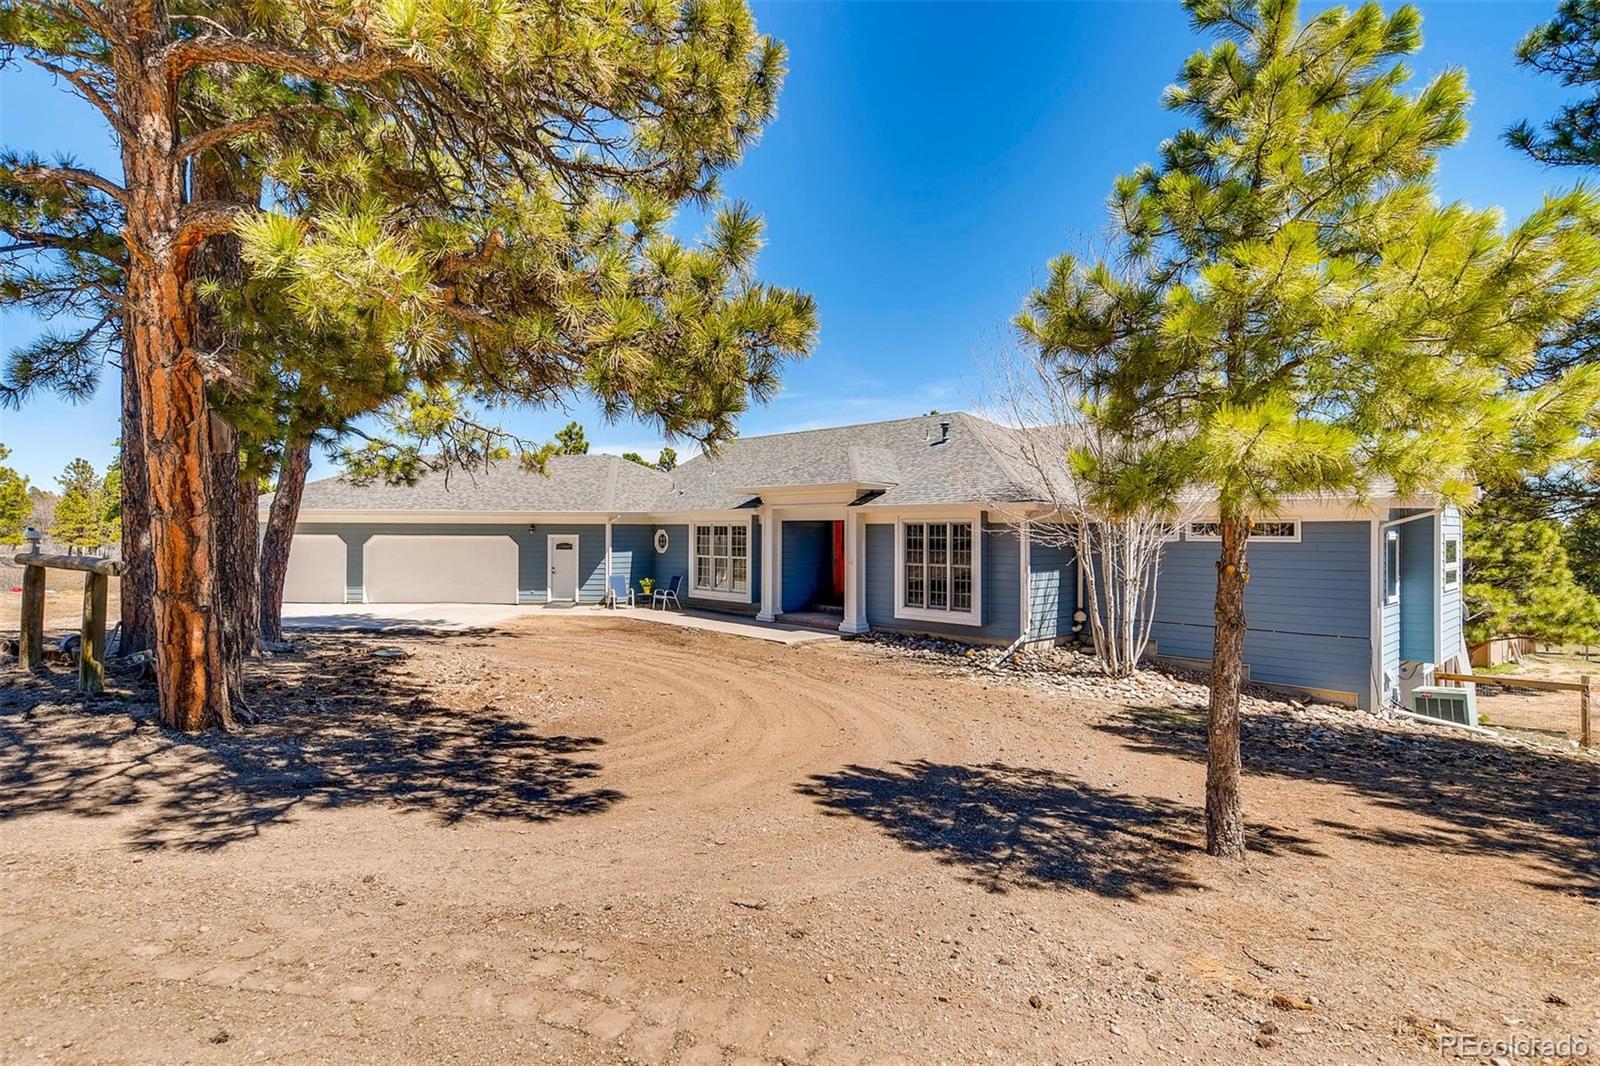 13112 Hawkeye Road, Kiowa, CO 80117 - Kiowa, CO real estate listing